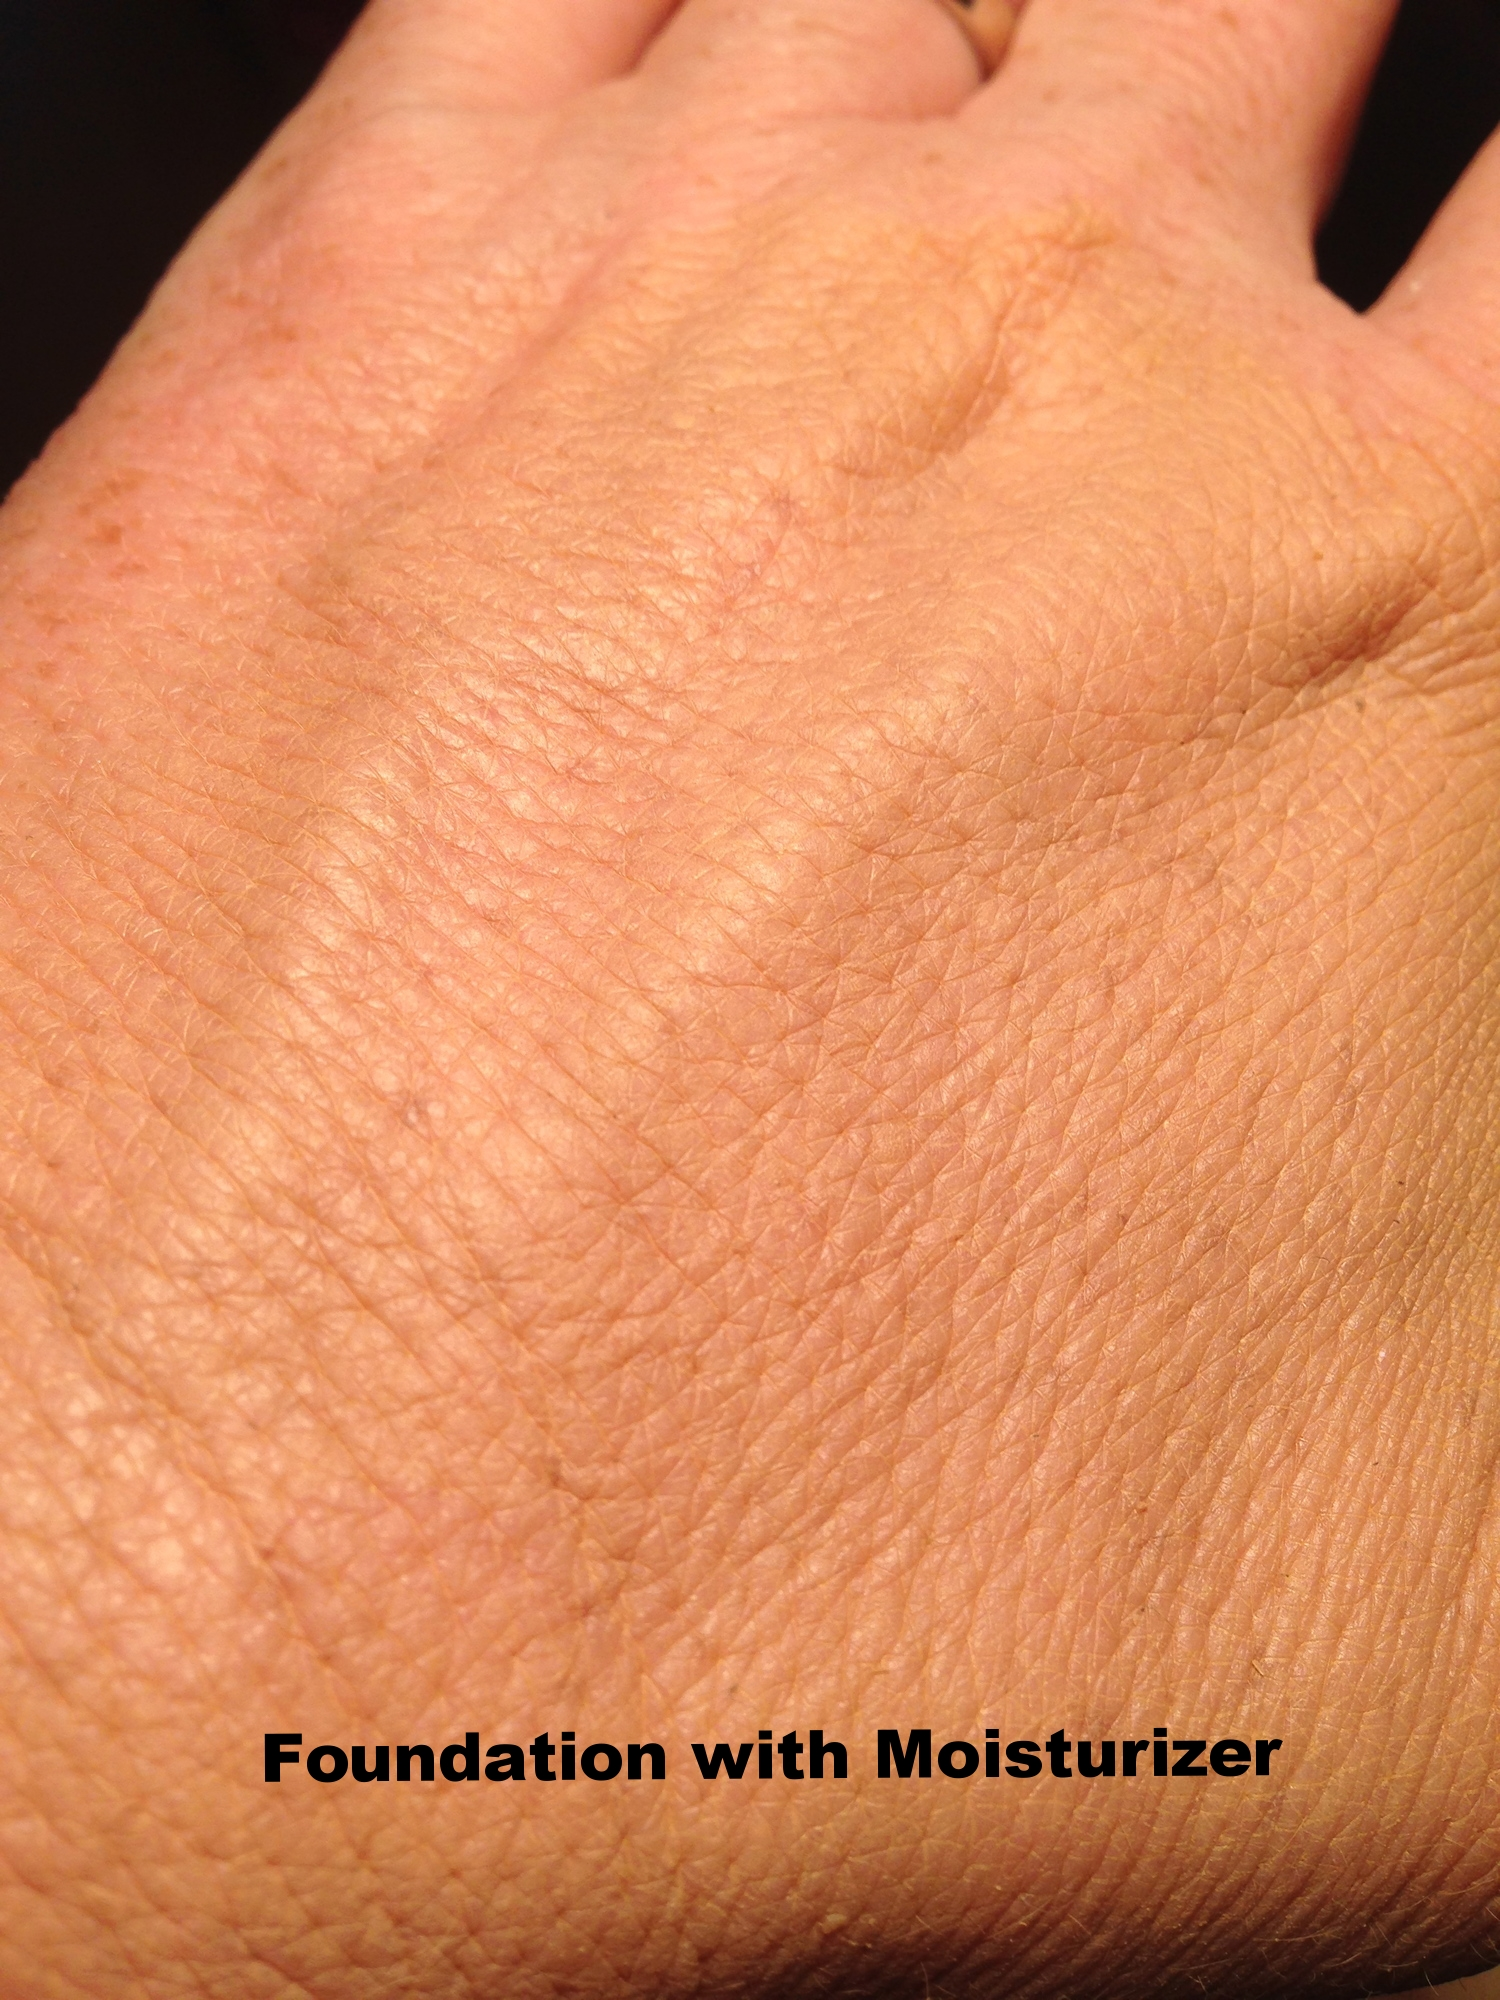 Foundation with moisturizer